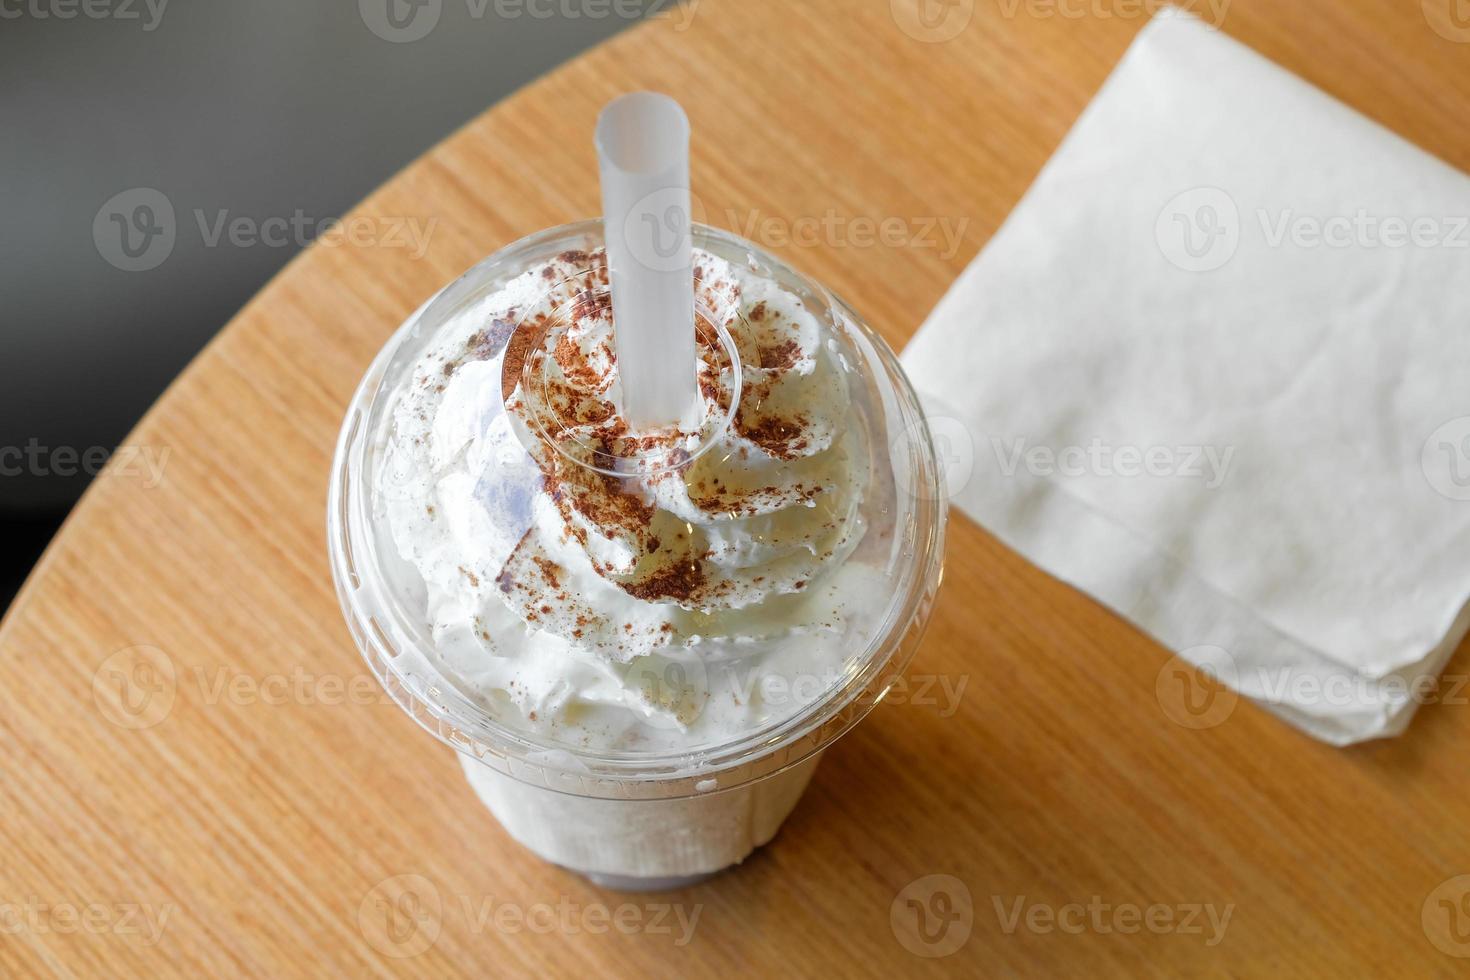 ischoklad frappe och vispgrädde i takeaway cup foto